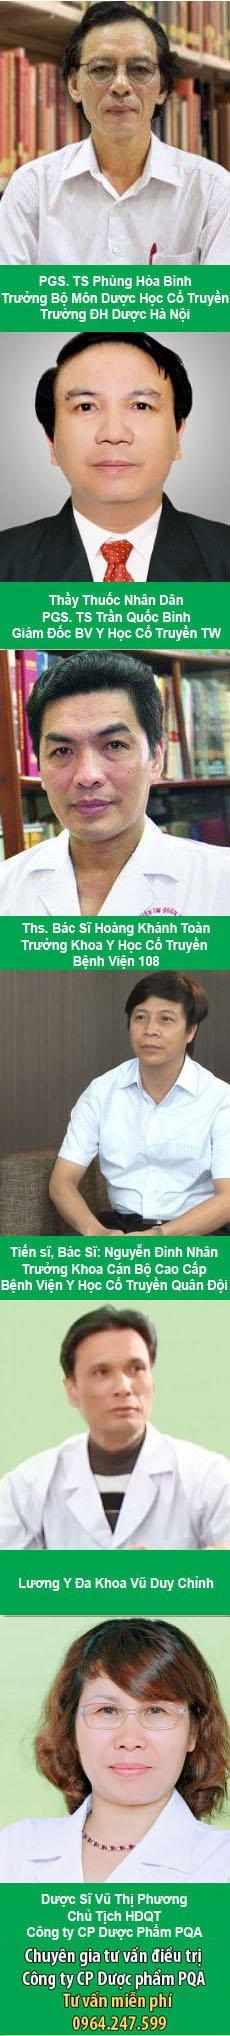 hoi-dong-khoa-hoc-pqa